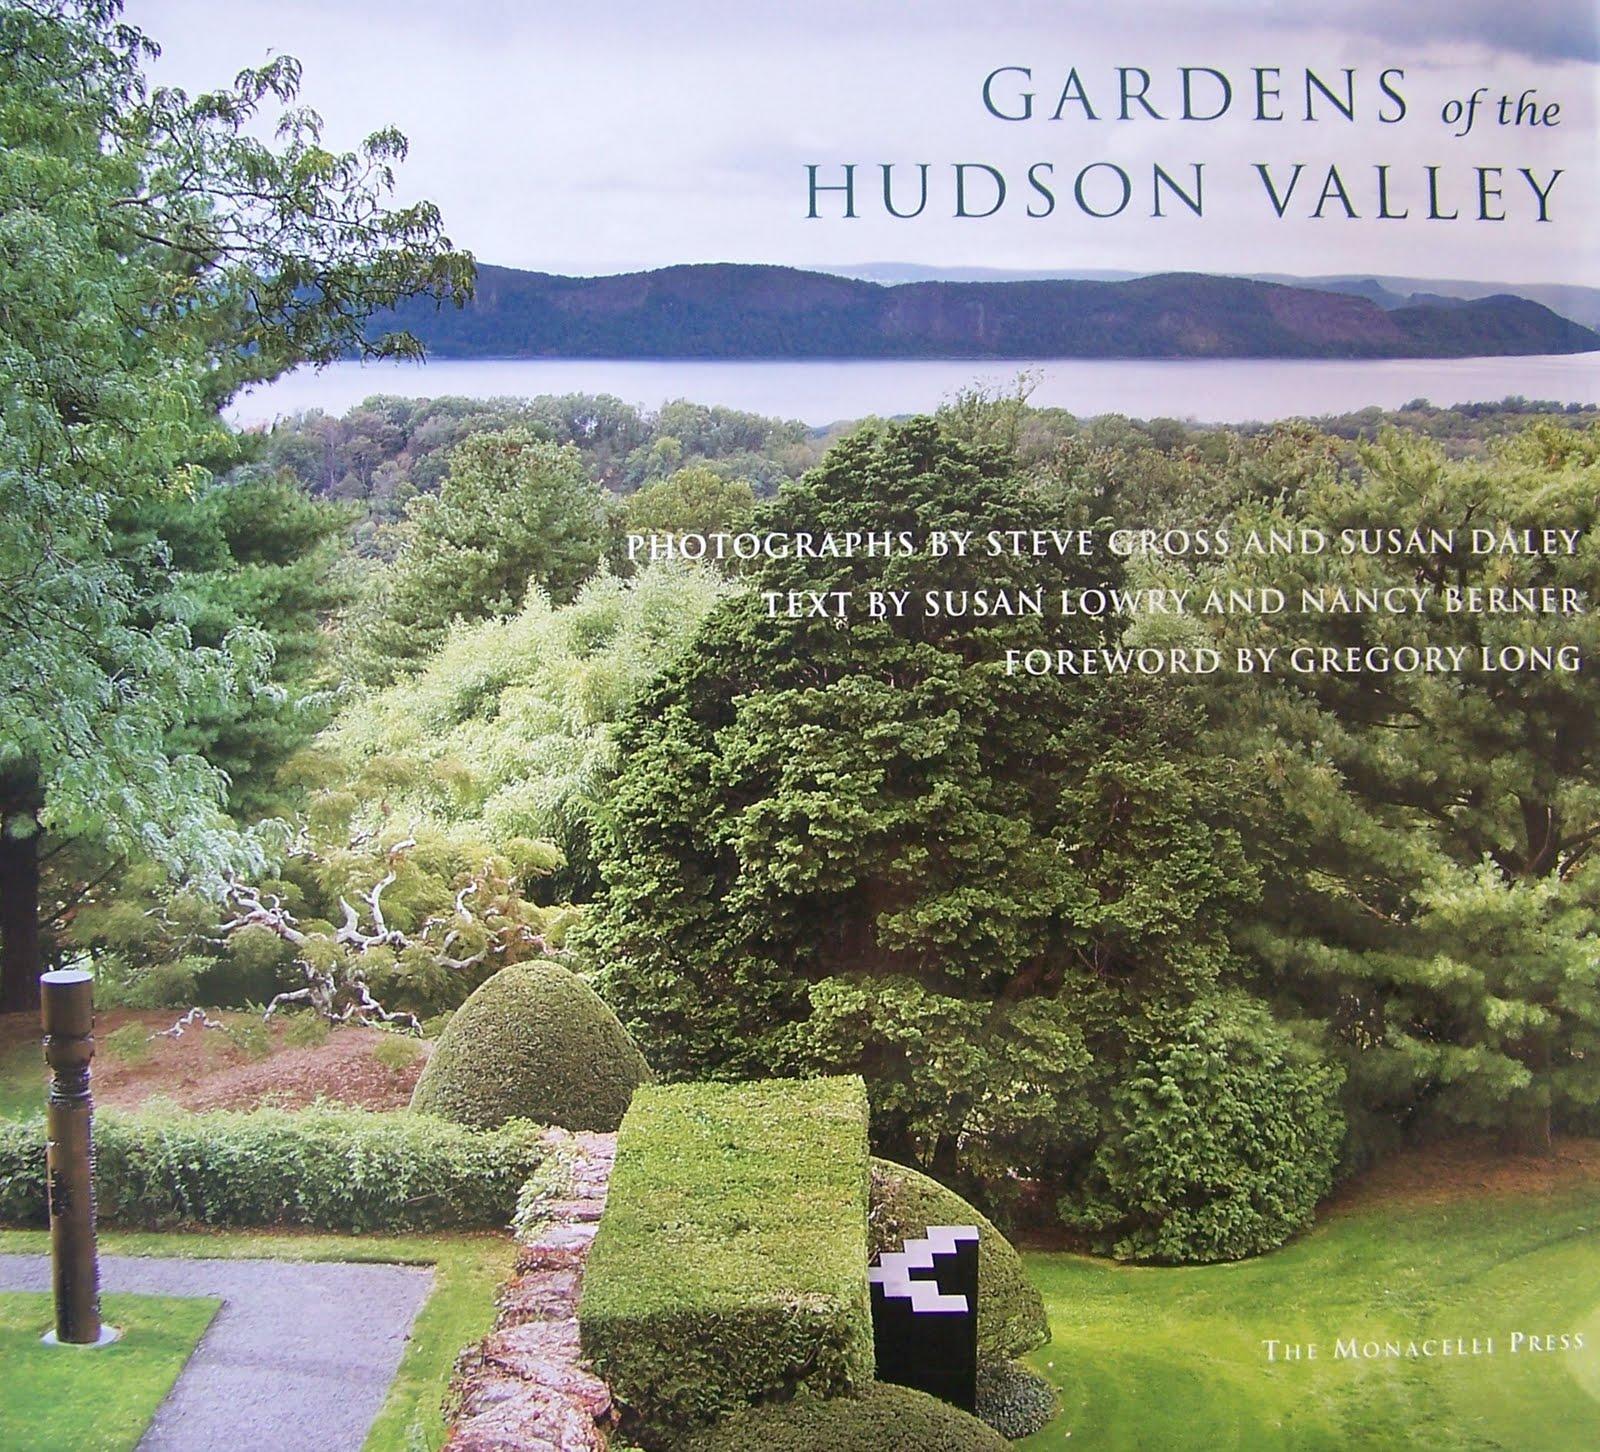 Garden Tour & Book Signing at Boscobel | The New York History Blog